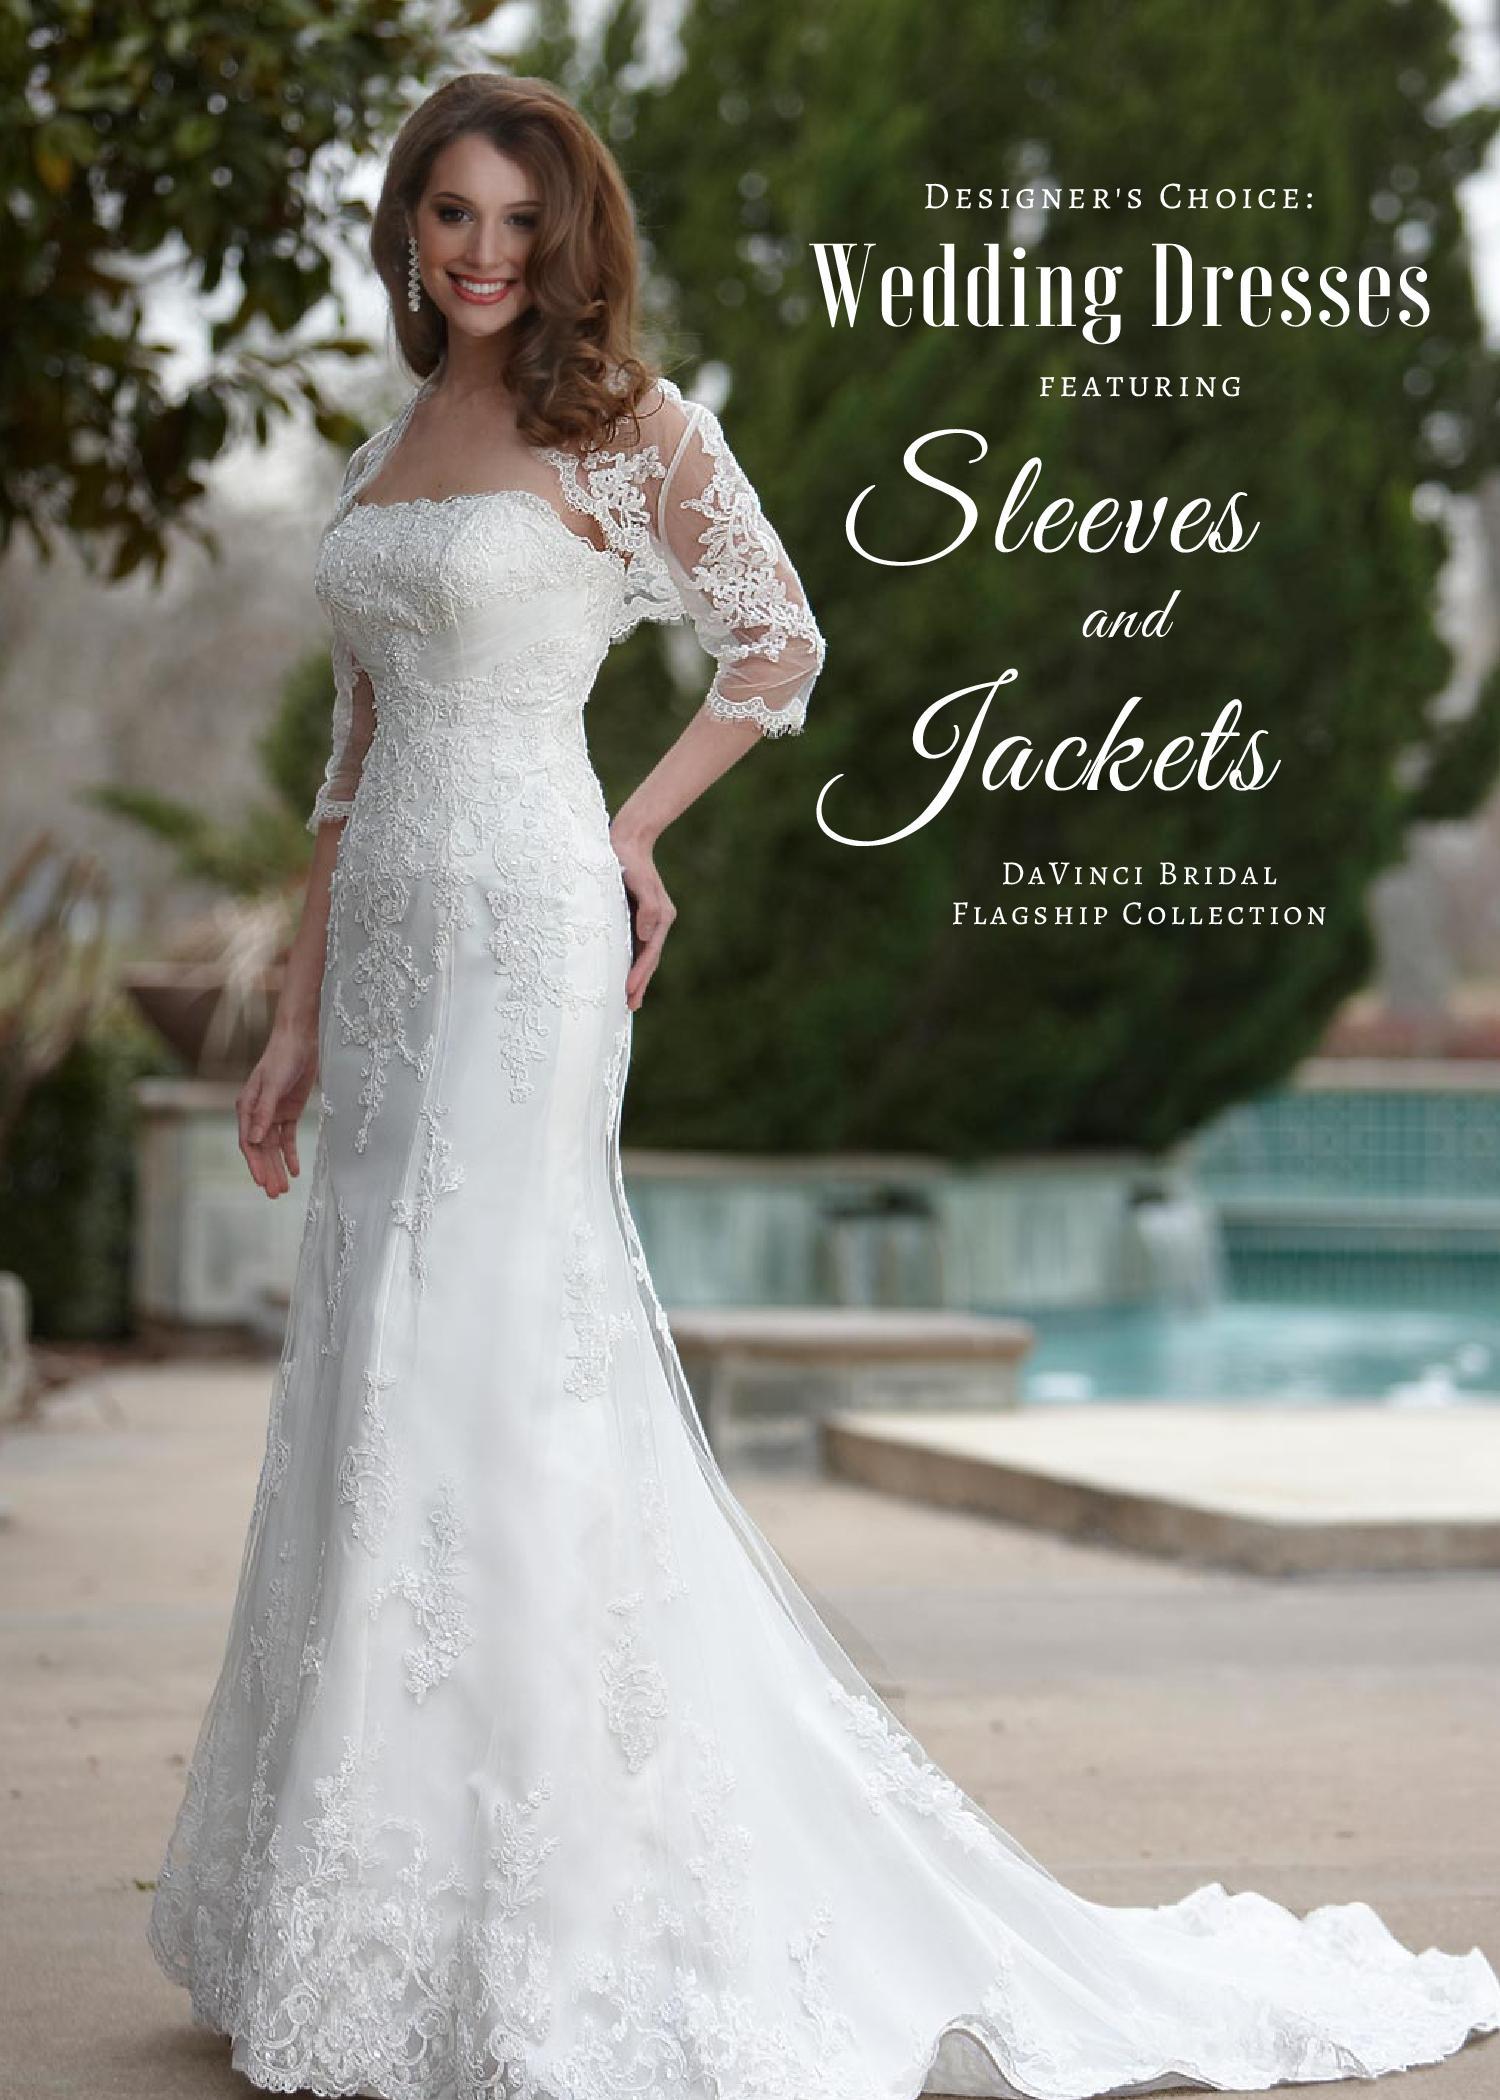 Stunning Wedding Dresses with Sleeves   Jackets - DaVinci Bridal Blog cf510f3b0